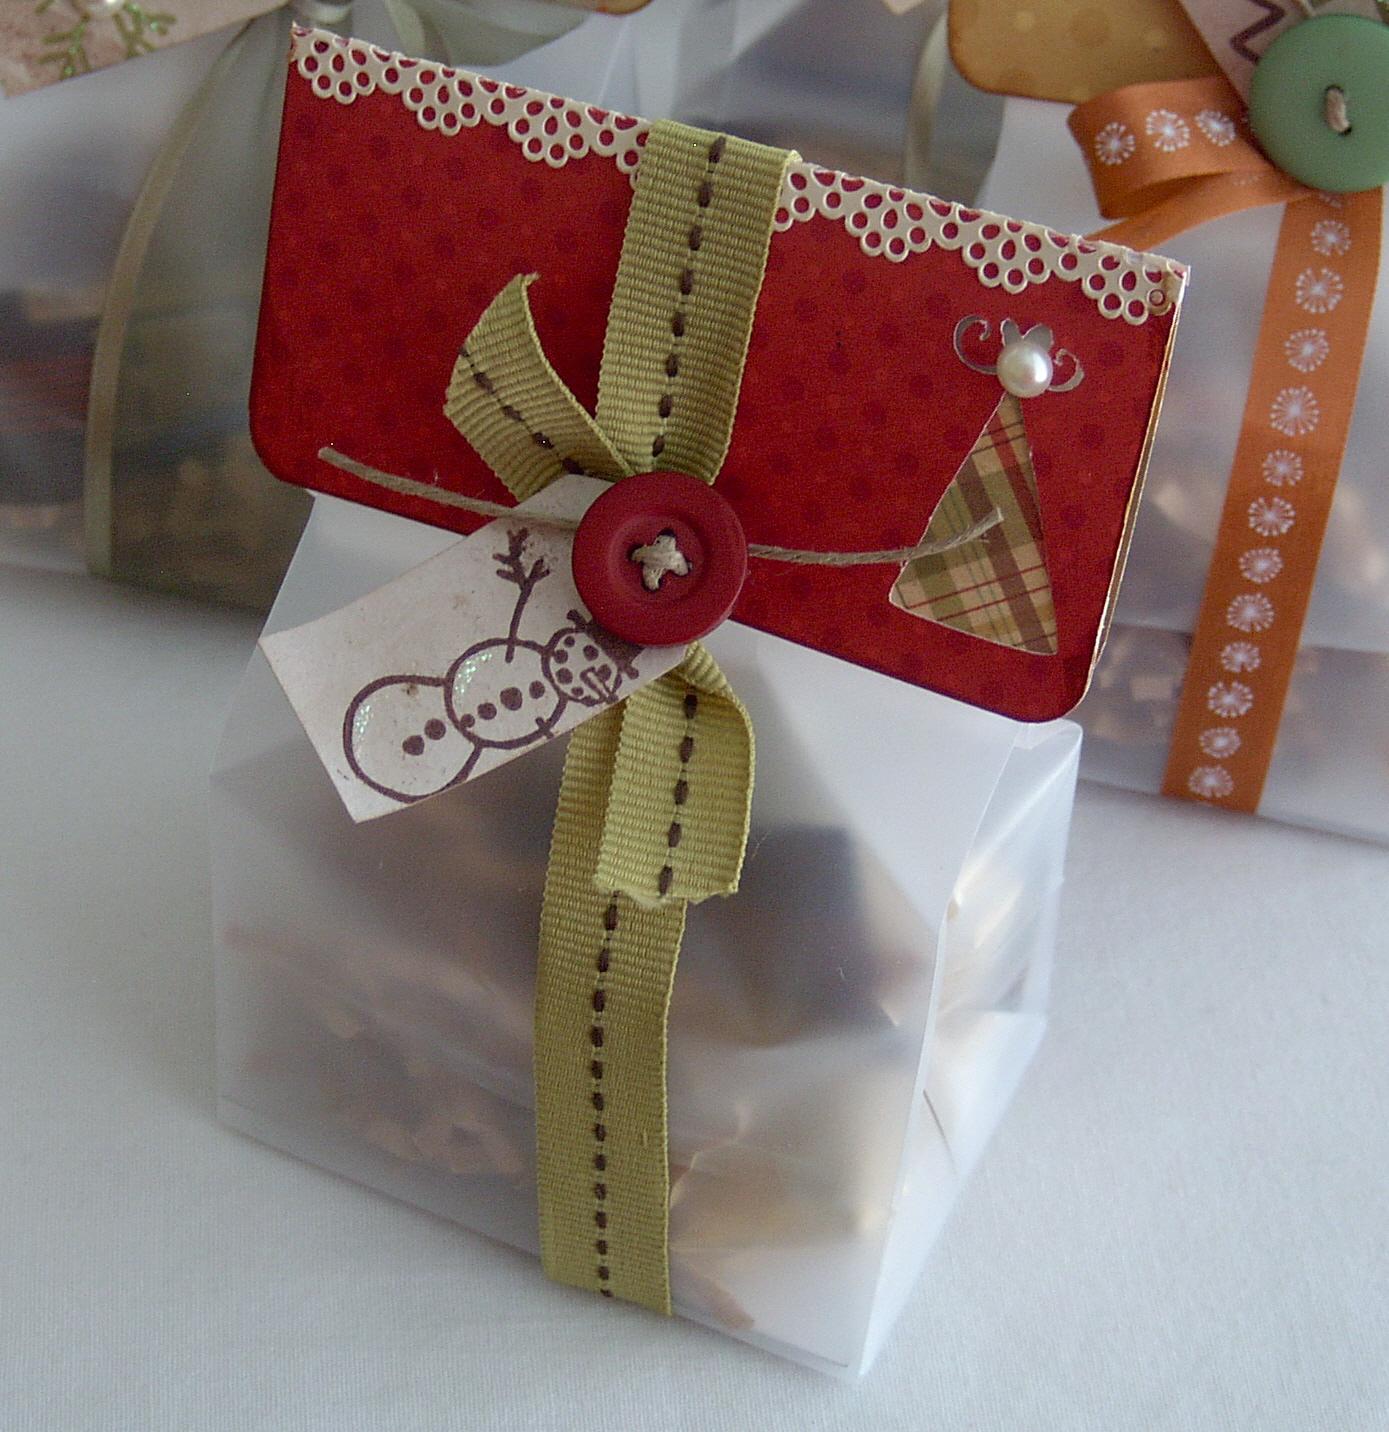 Holidaytreatbag5